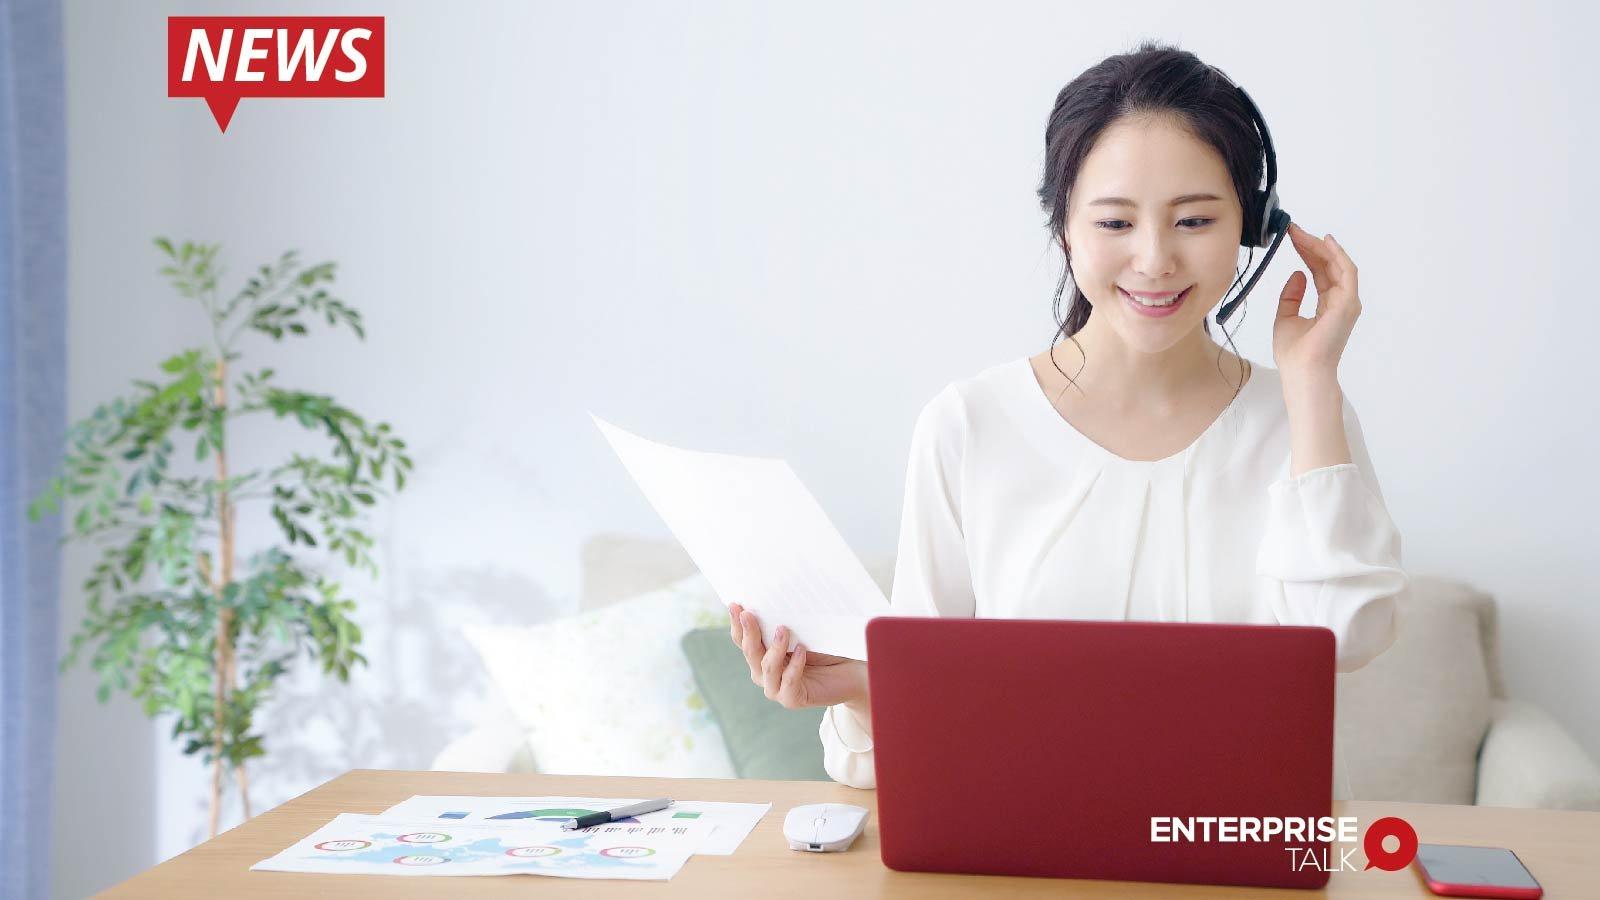 Lifesize Announces Enterprise-Grade End-to-End Encryption for All